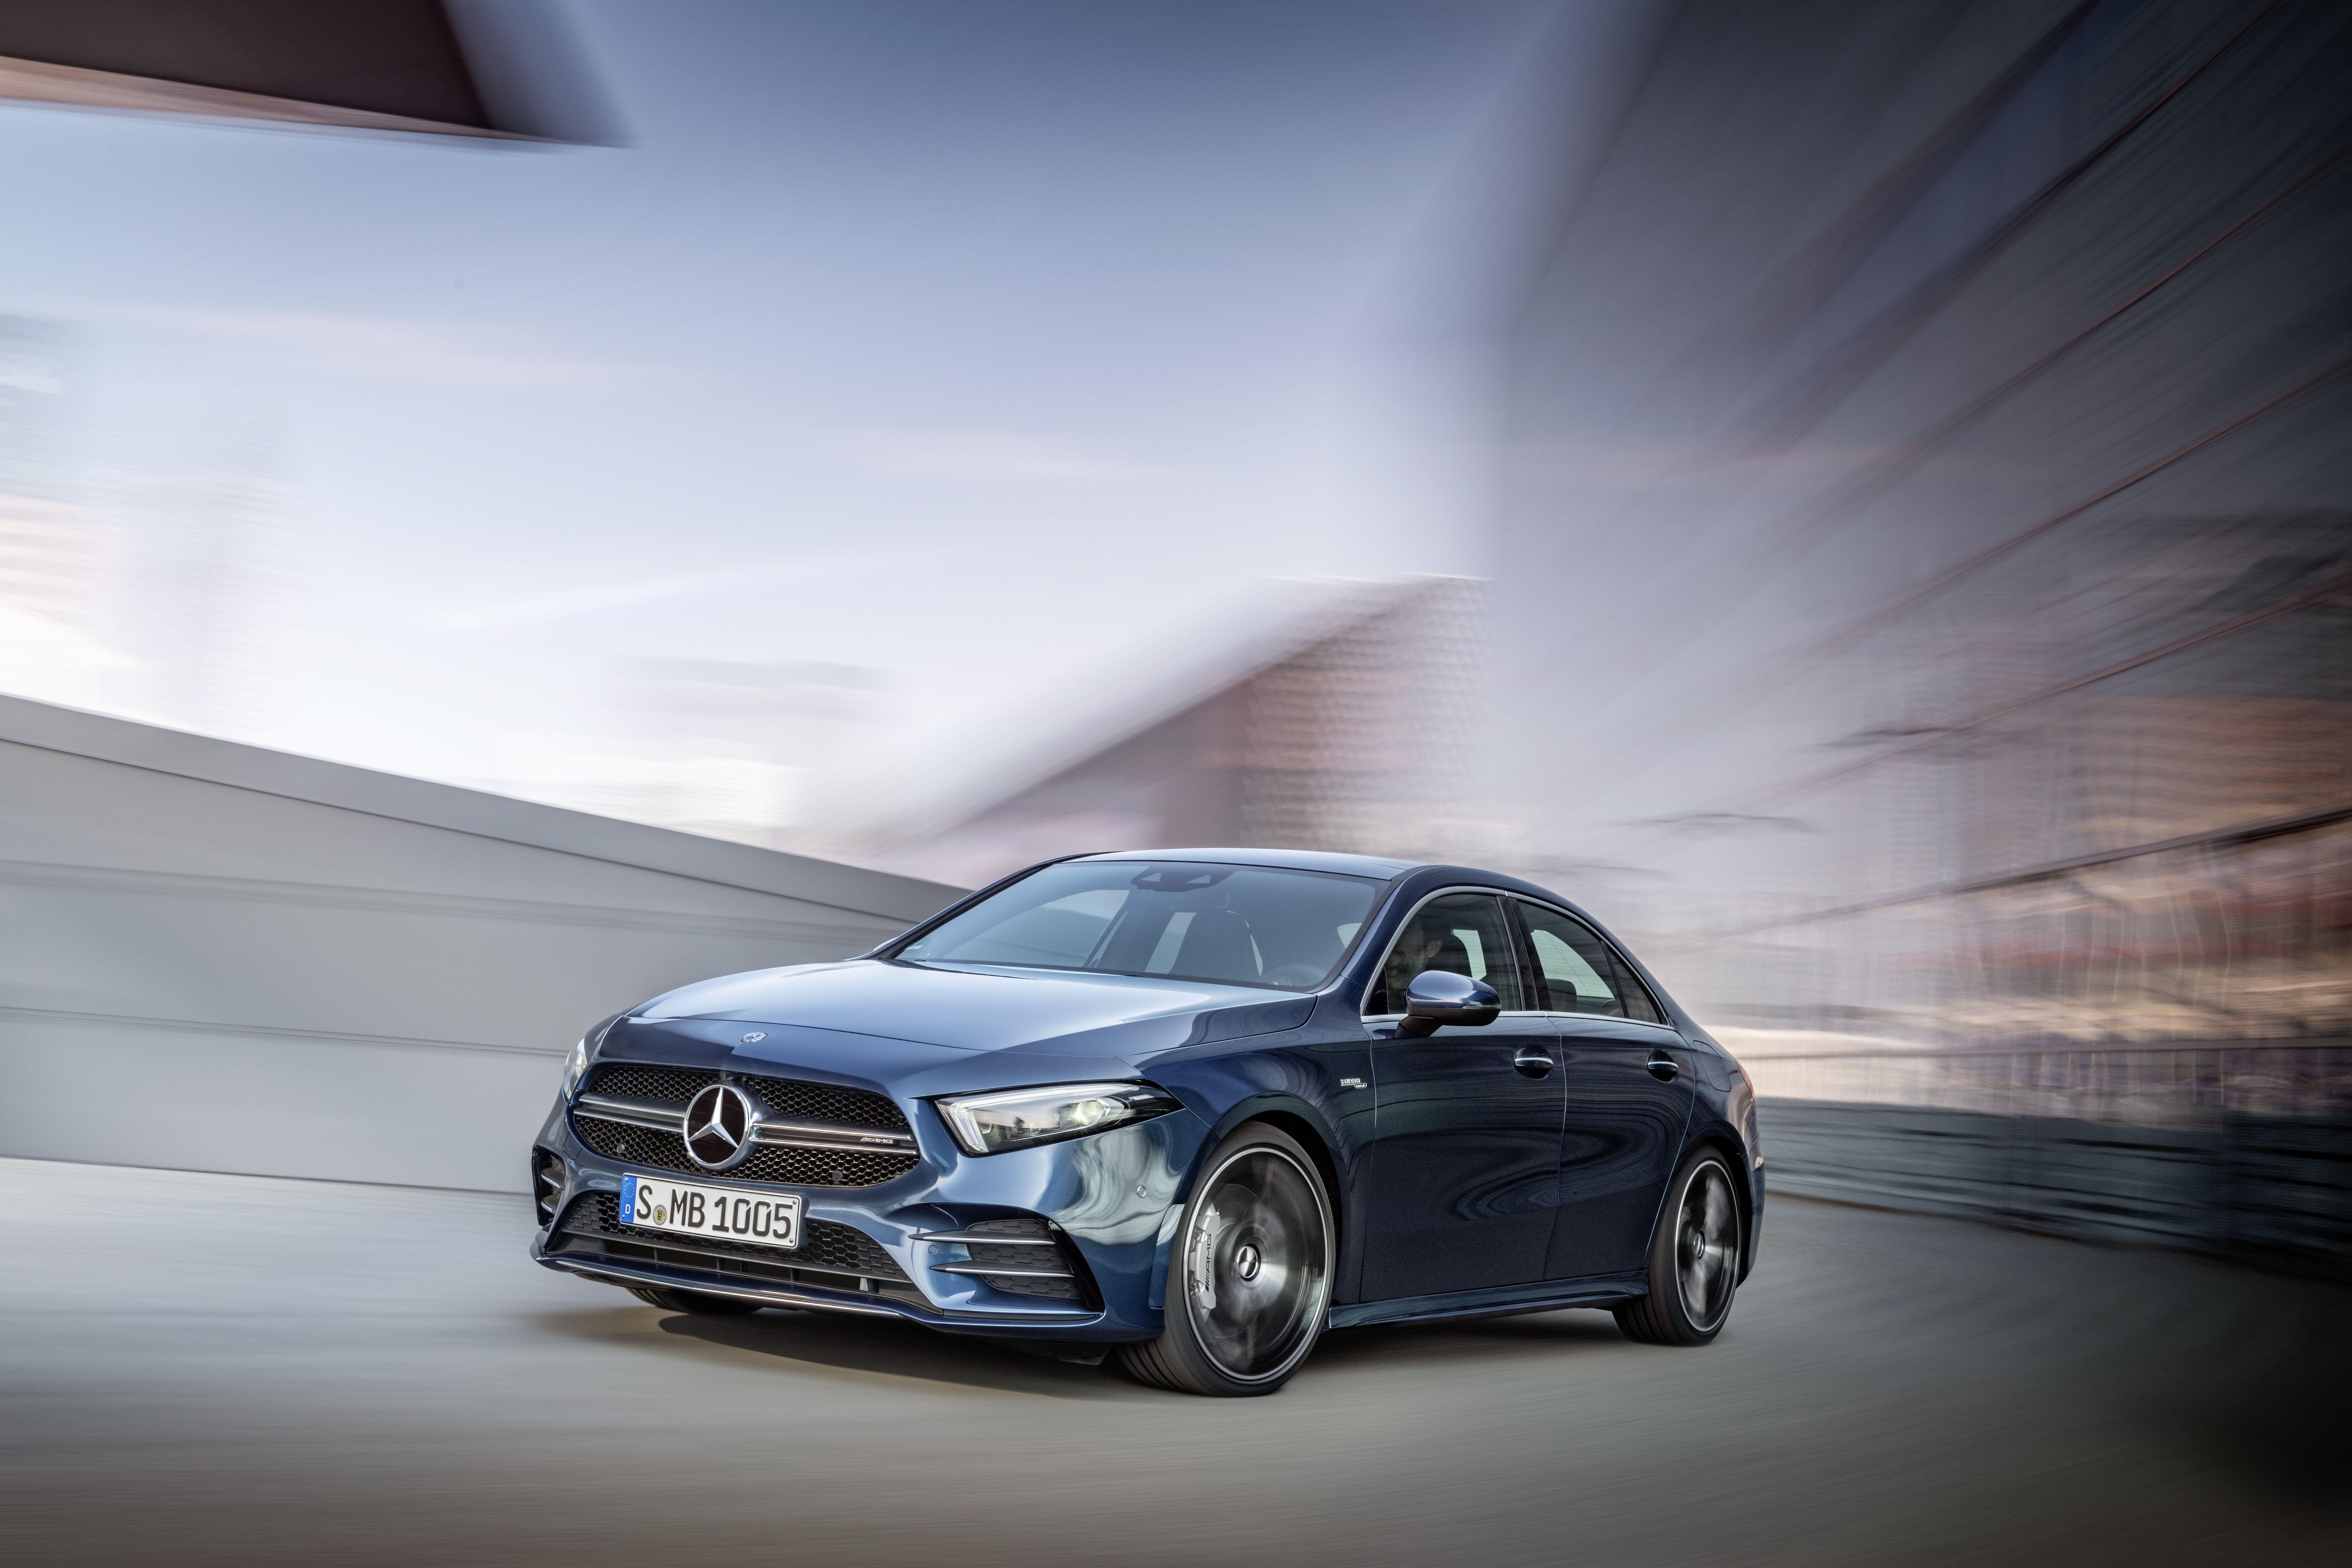 2020 Mercedes Amg A45